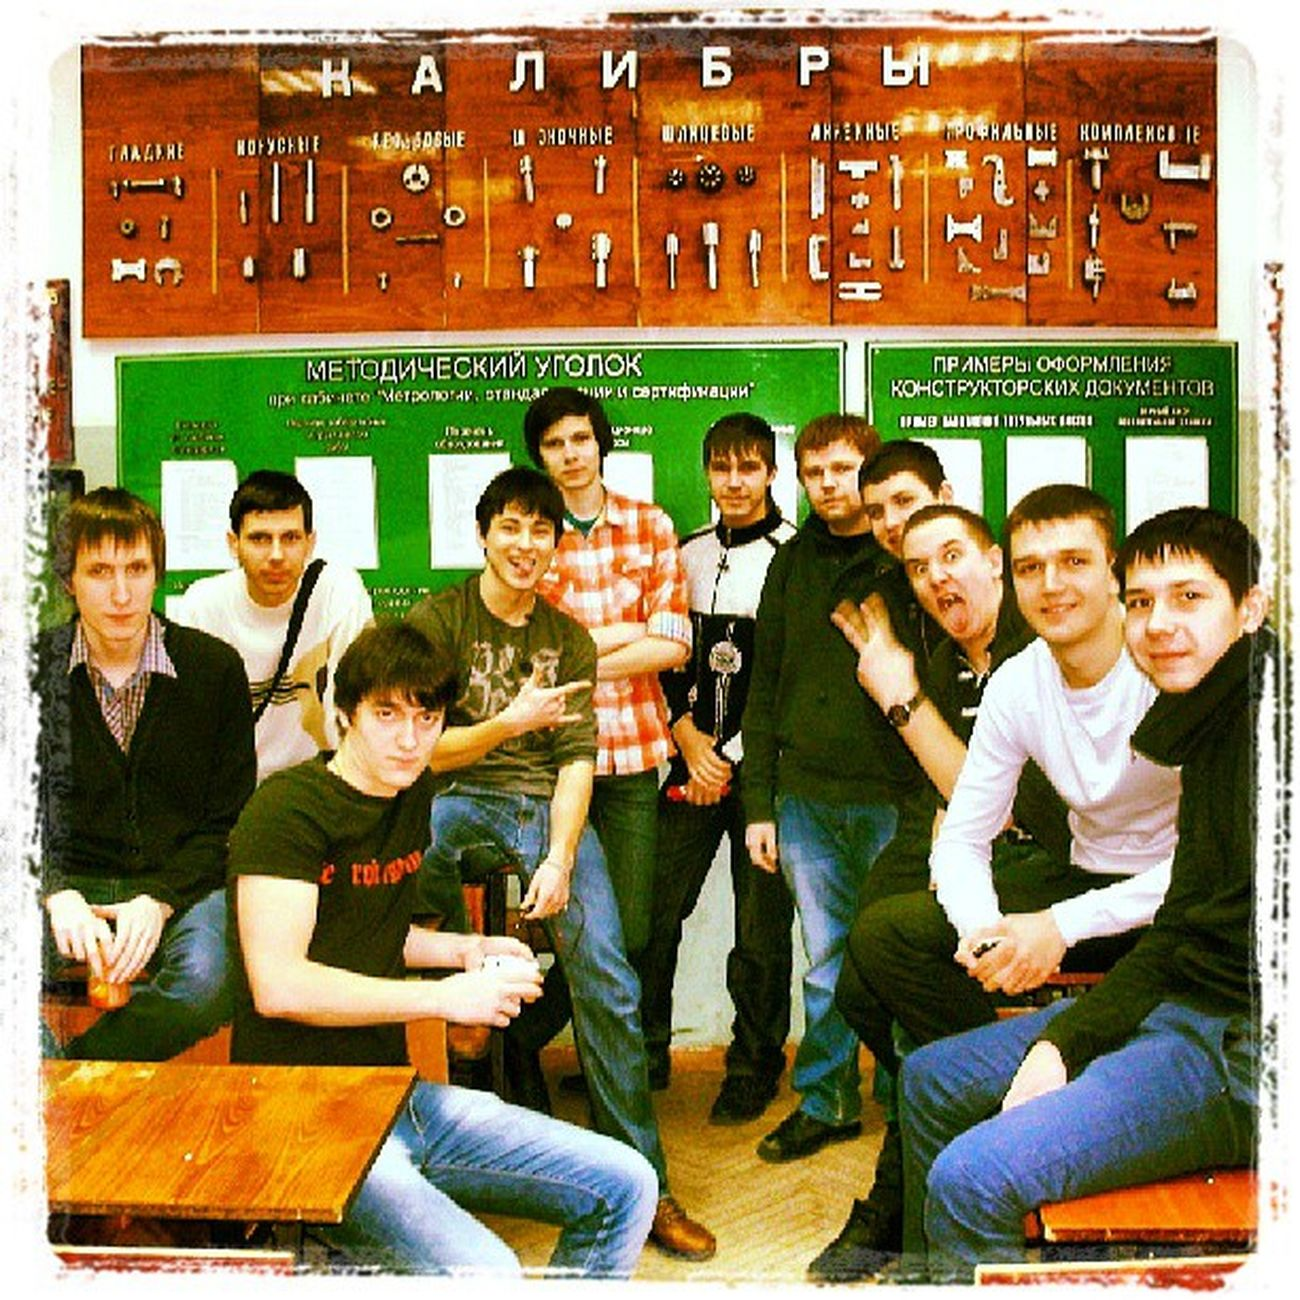 колледж Automation автоматизация придурки красавчики парни boys russian калибры